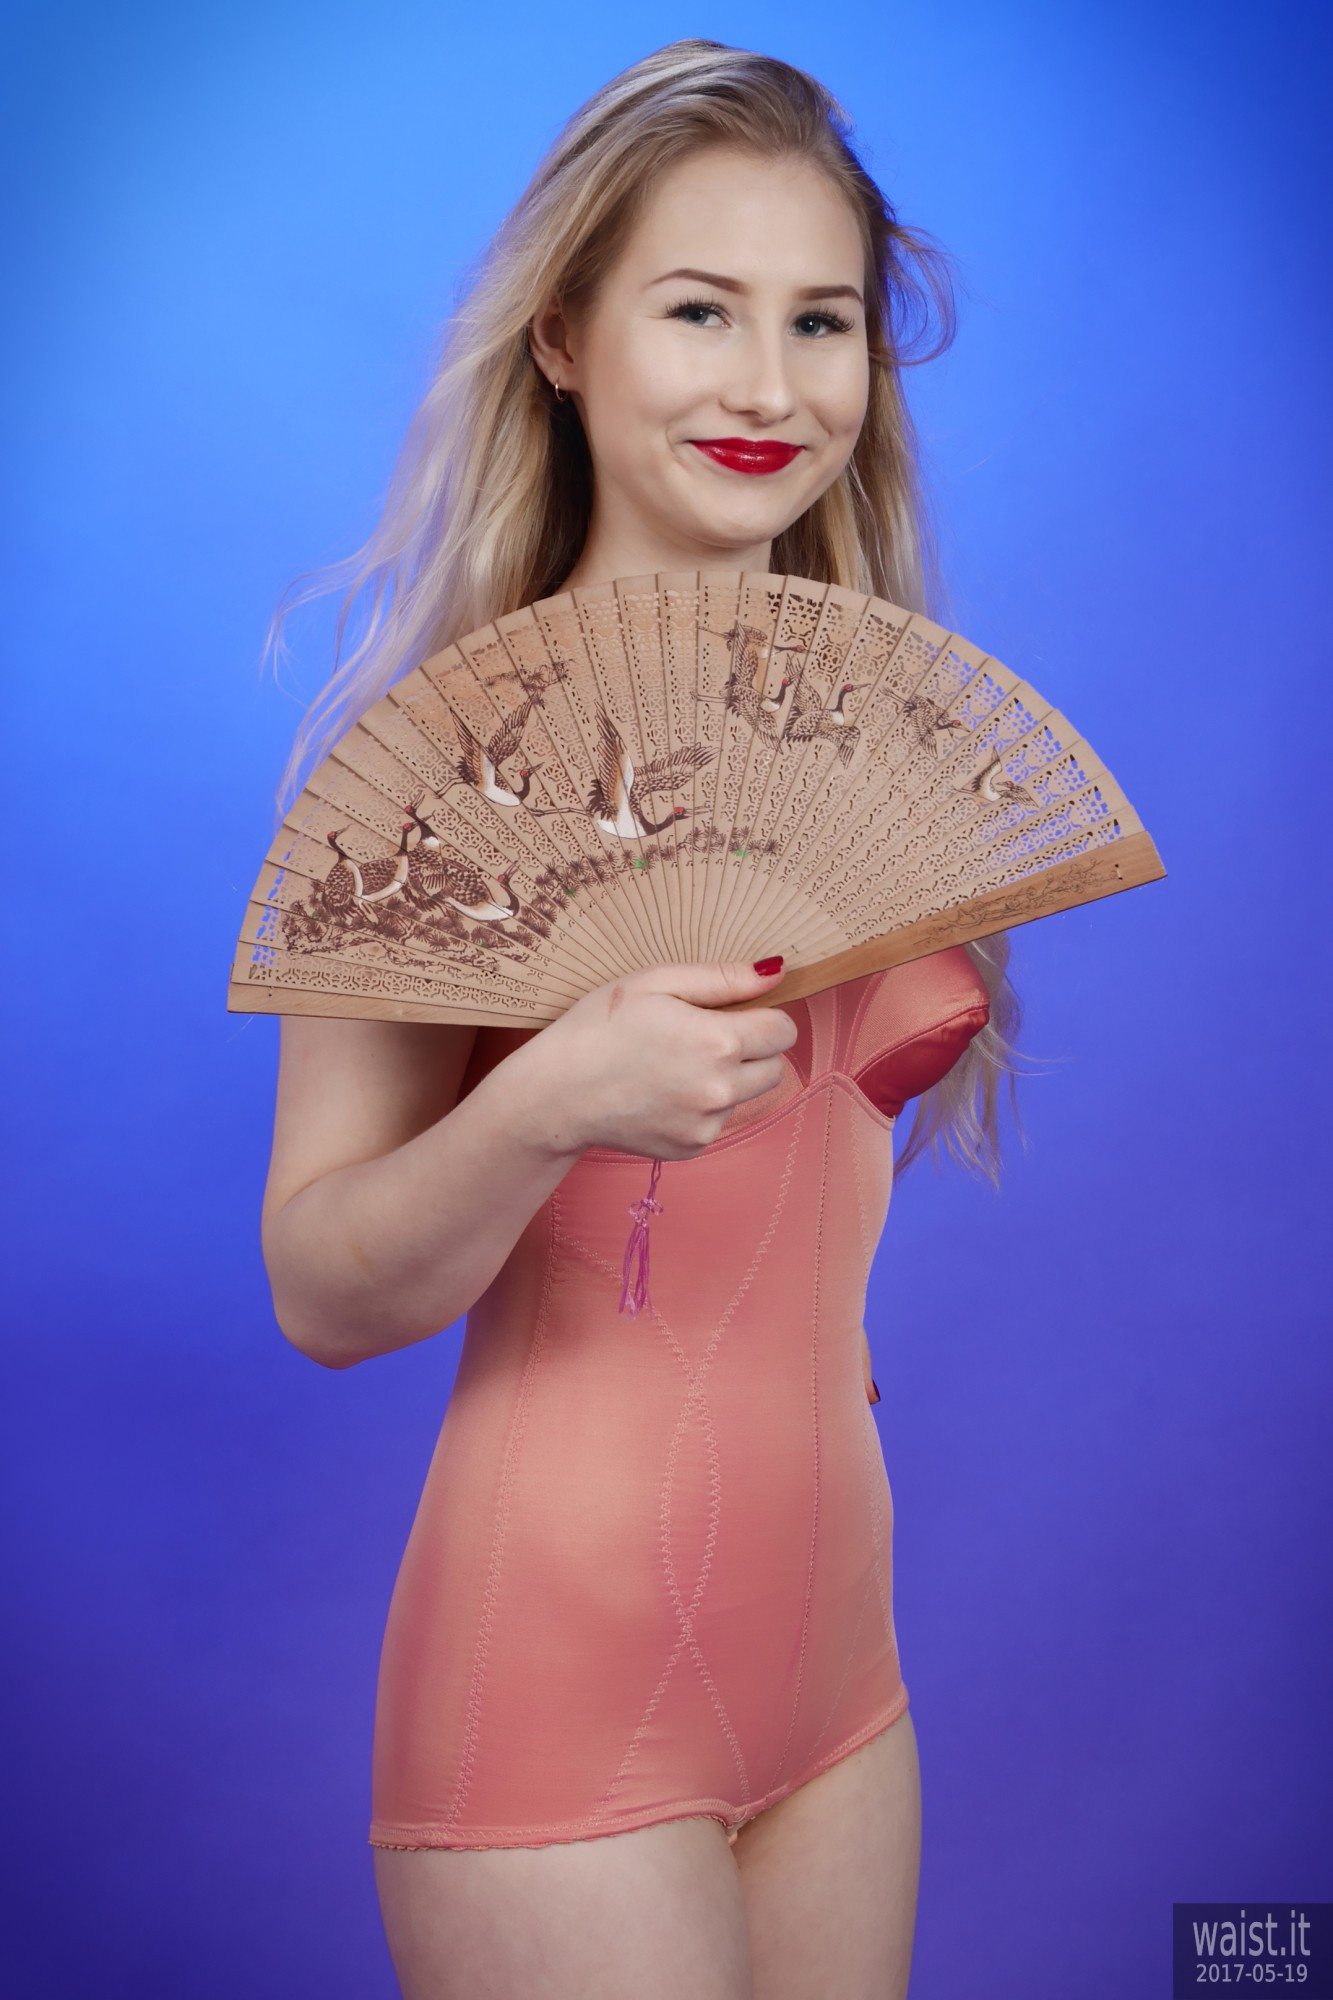 2017-05-19 Laura Sele pink 1960s pantie corselette